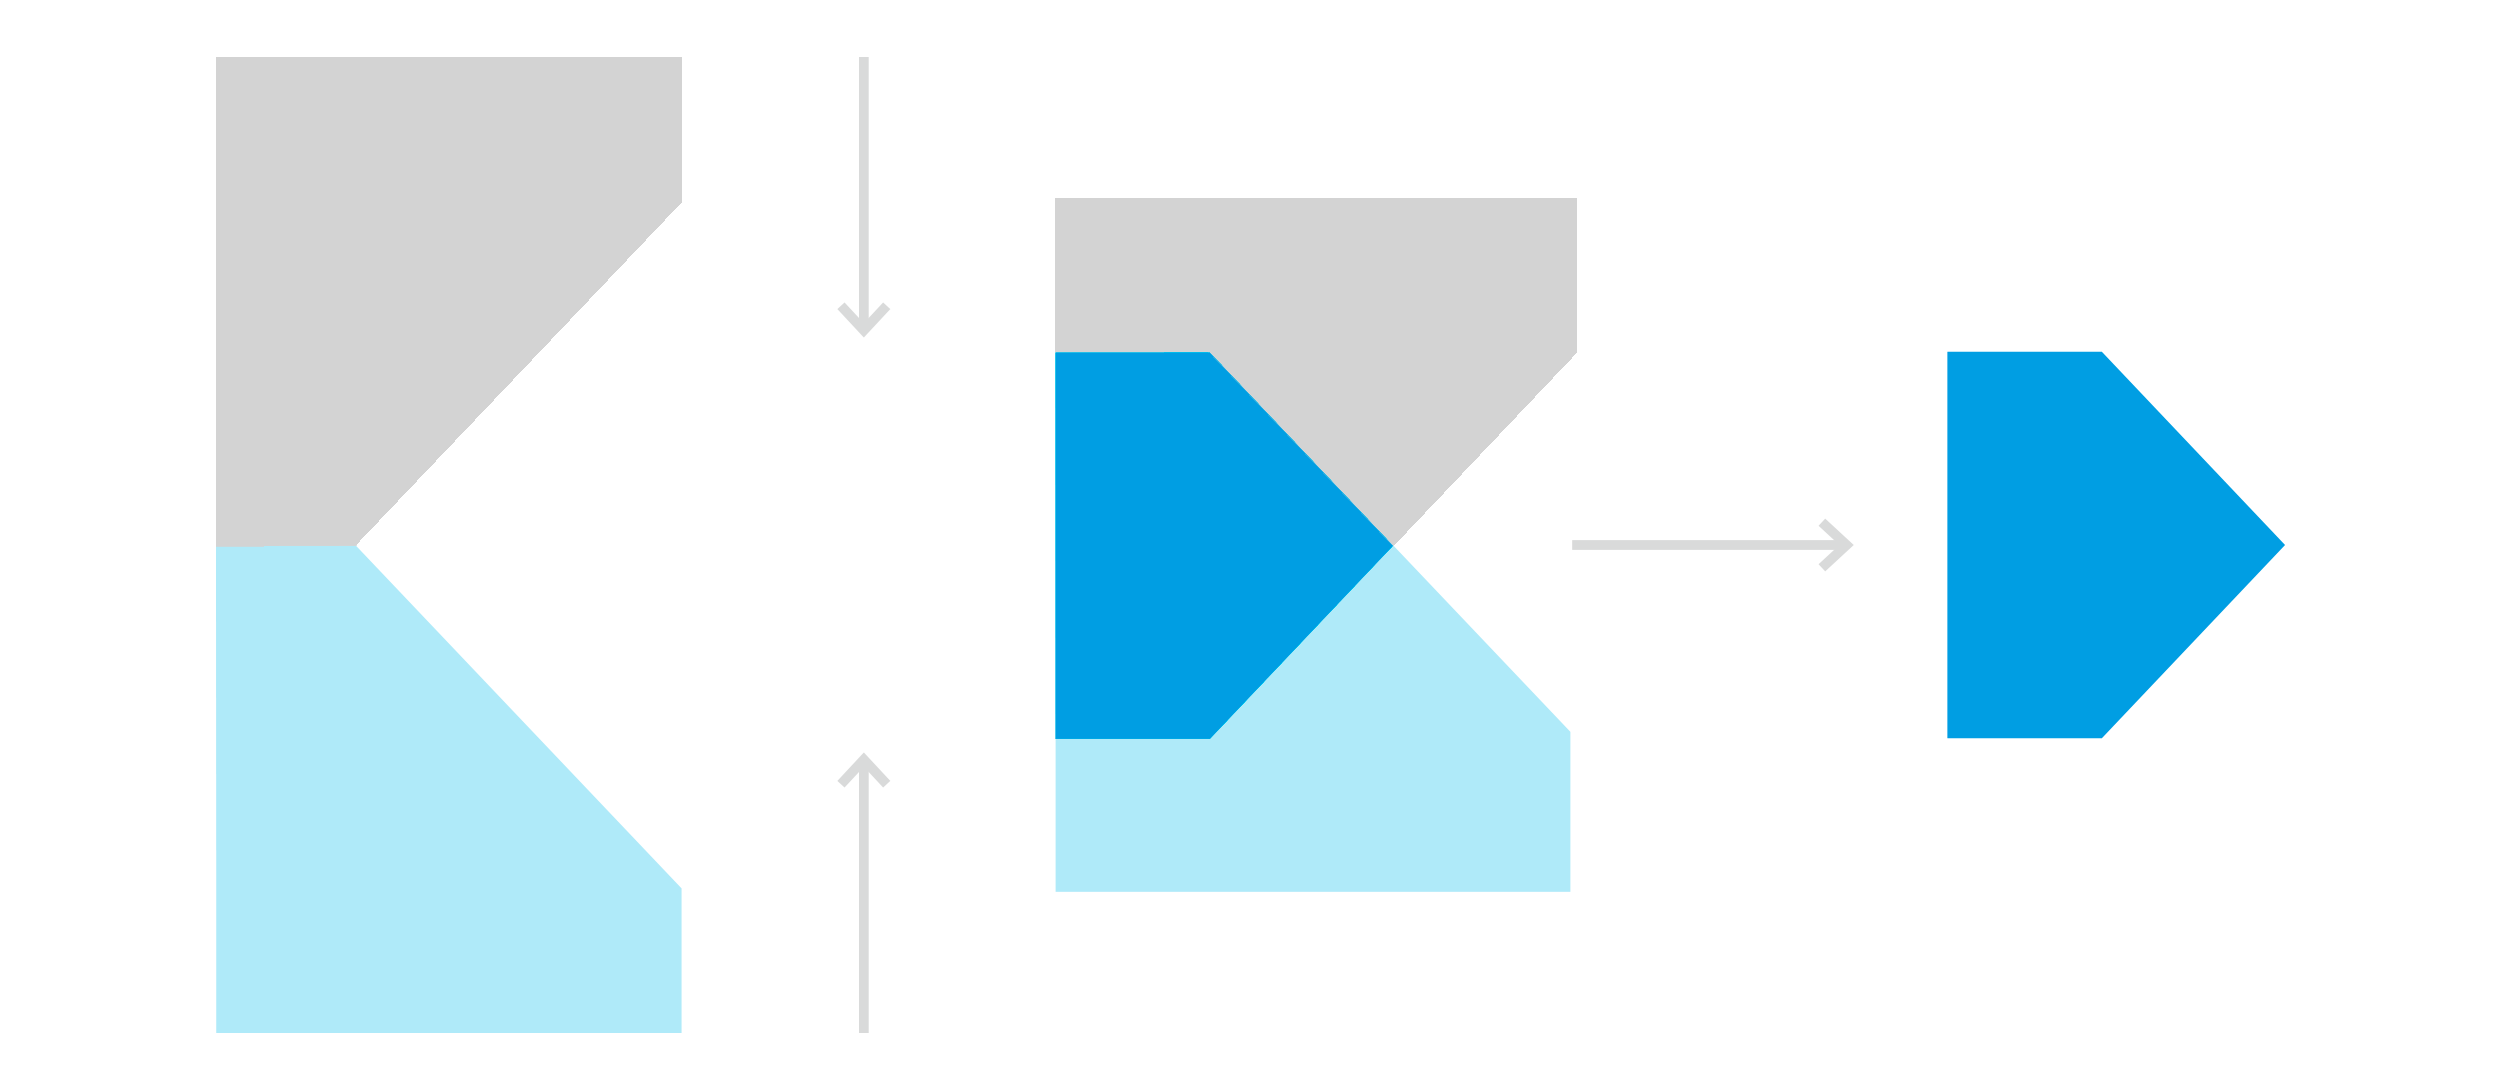 cyclos KrampeHarex Lösungspfeil